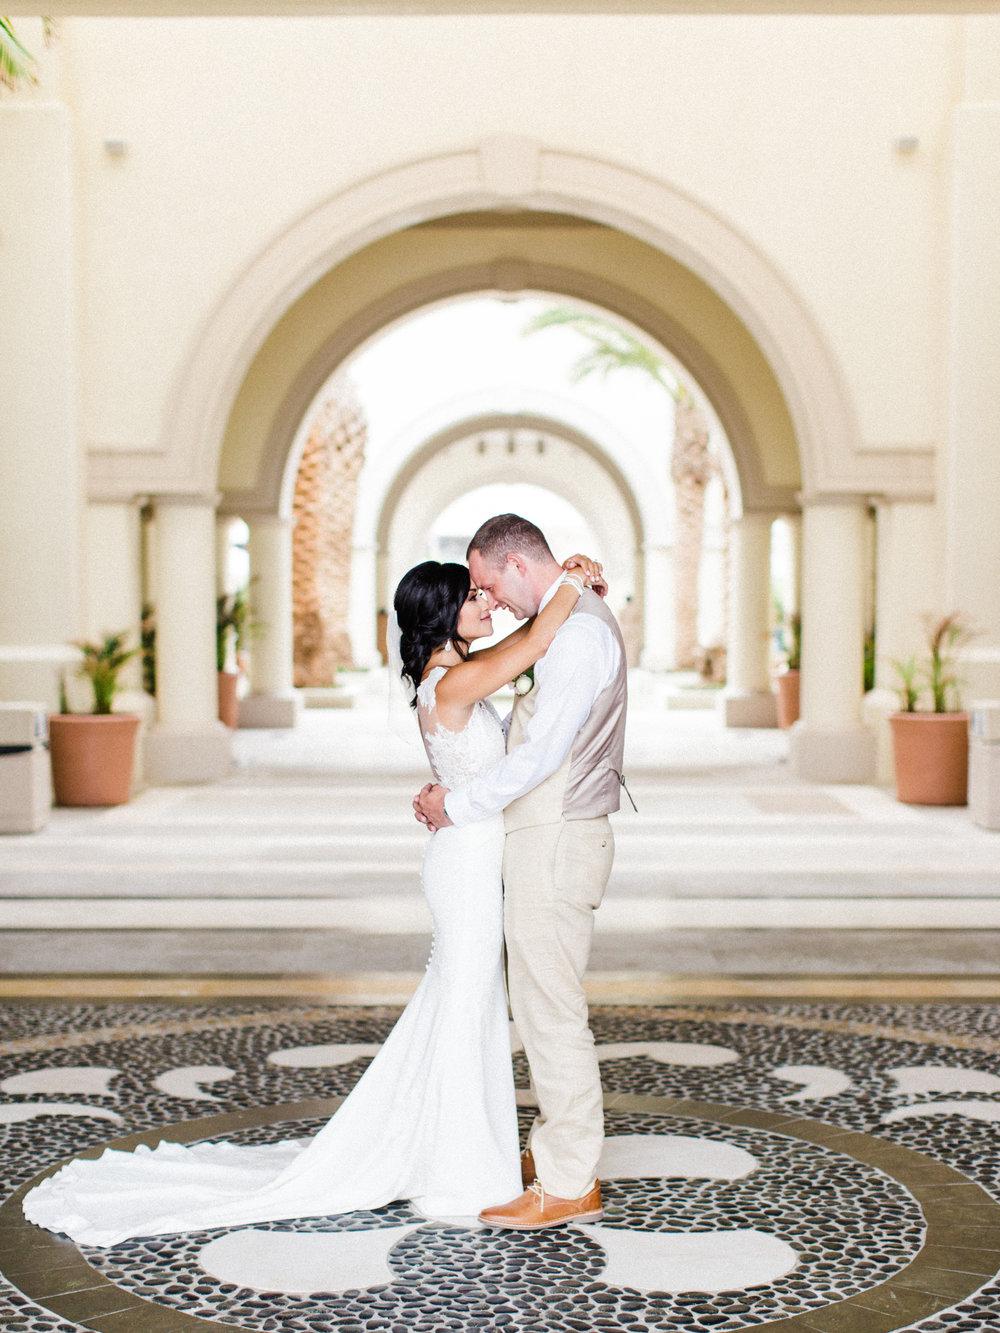 Deanna-and-John-Fahey-Wedding-Los-Cabos-Mexico-Brandon-J-Ferlin-Photography-235.jpg